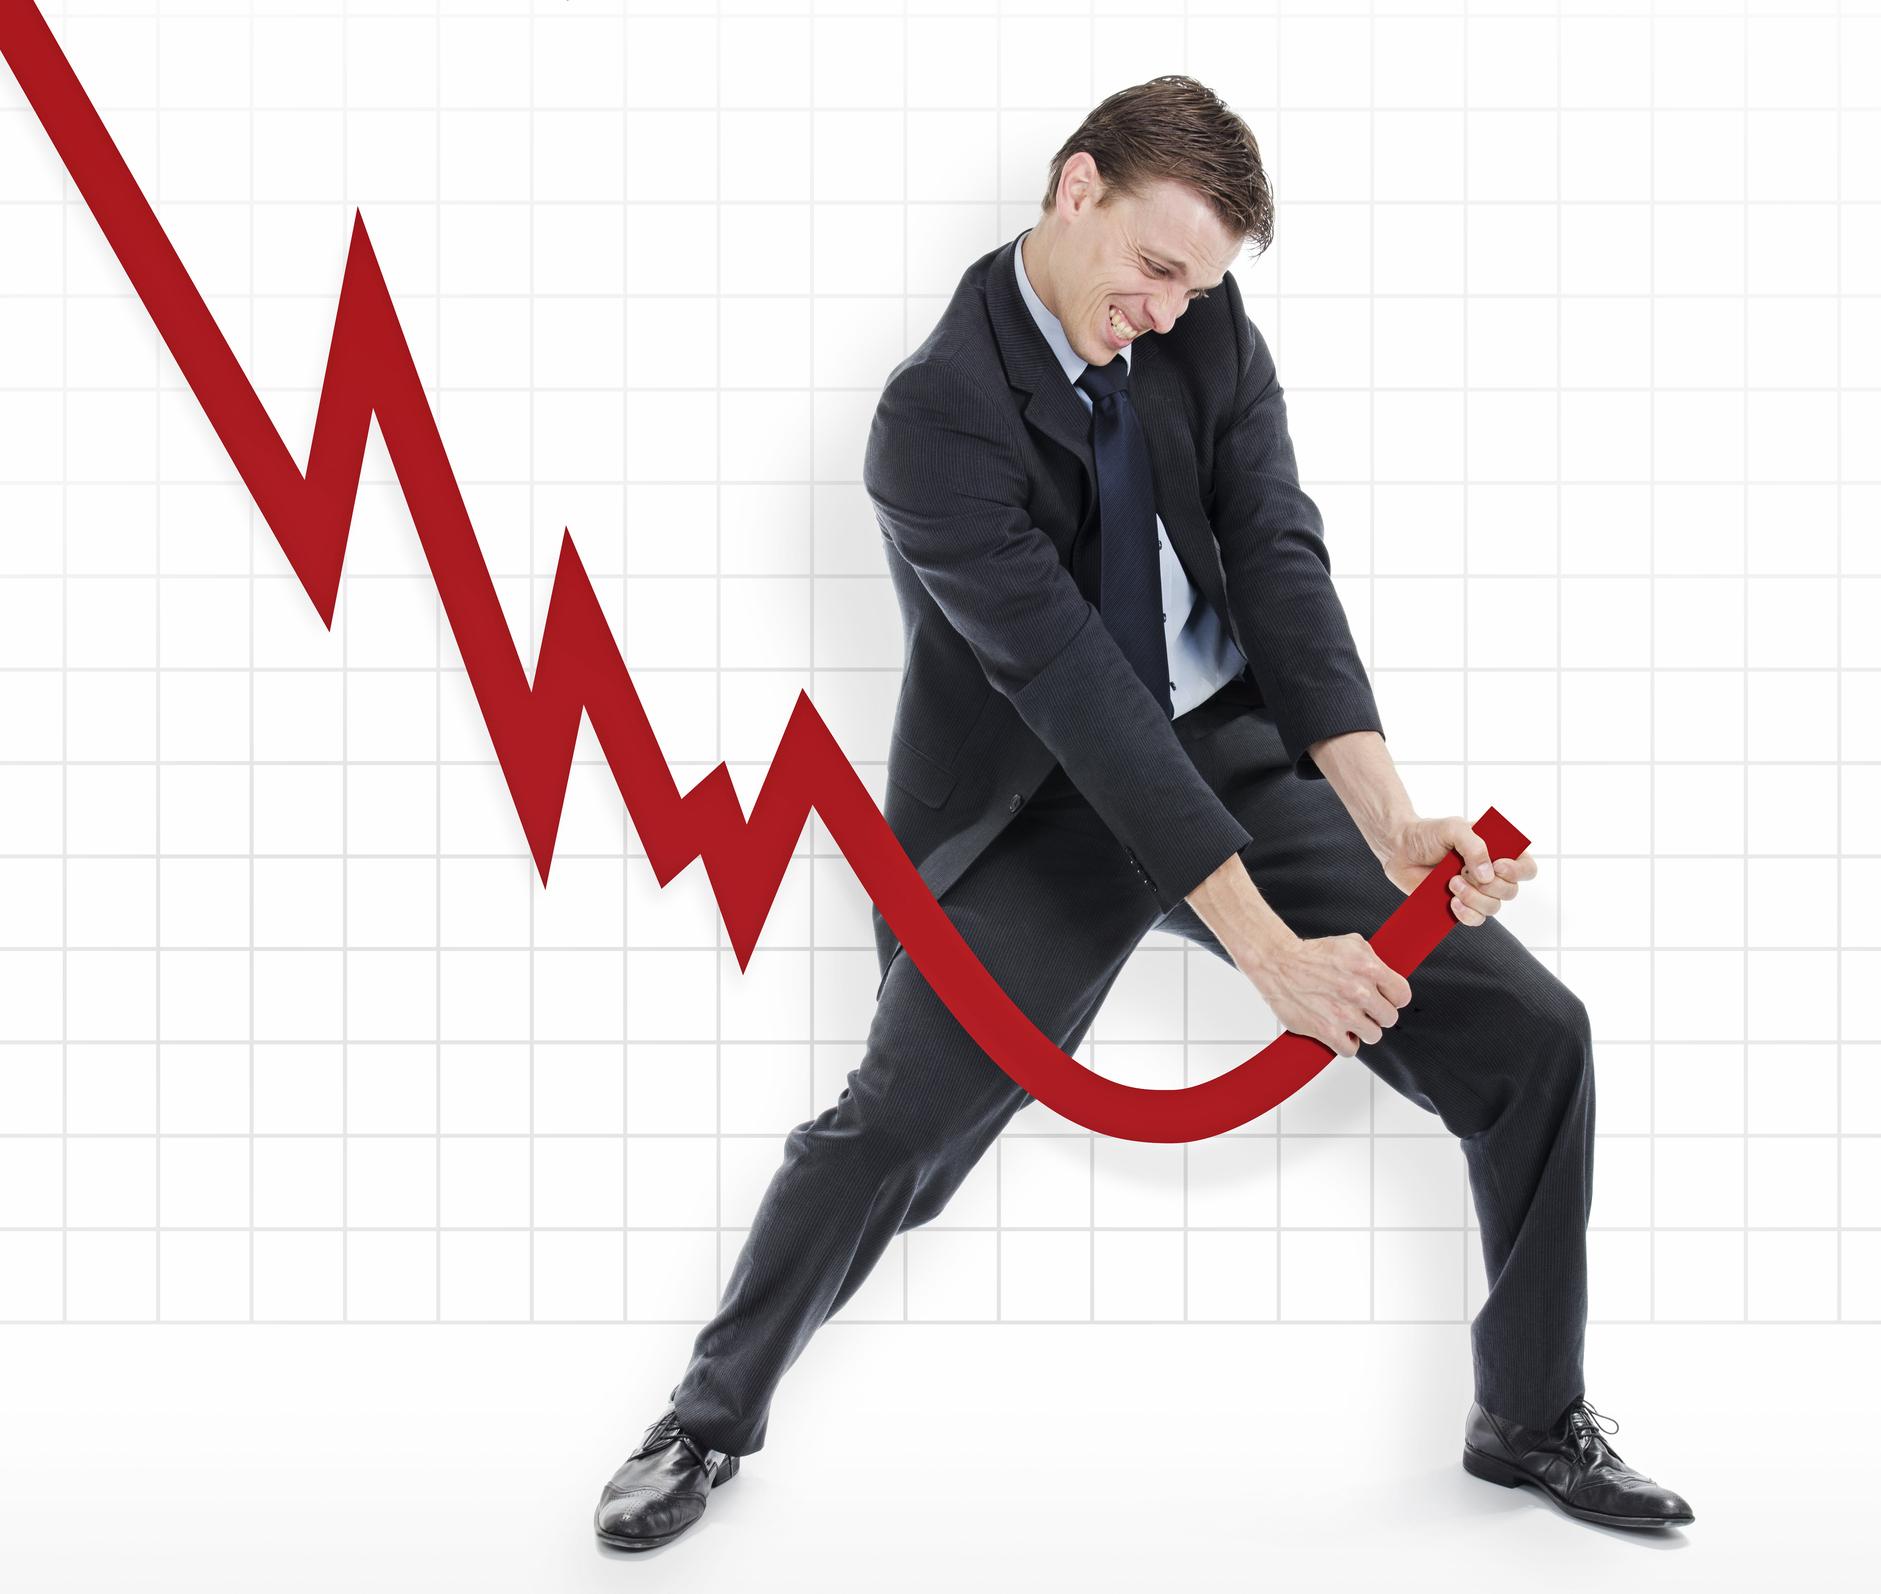 Businessman pulling declining red line back up.